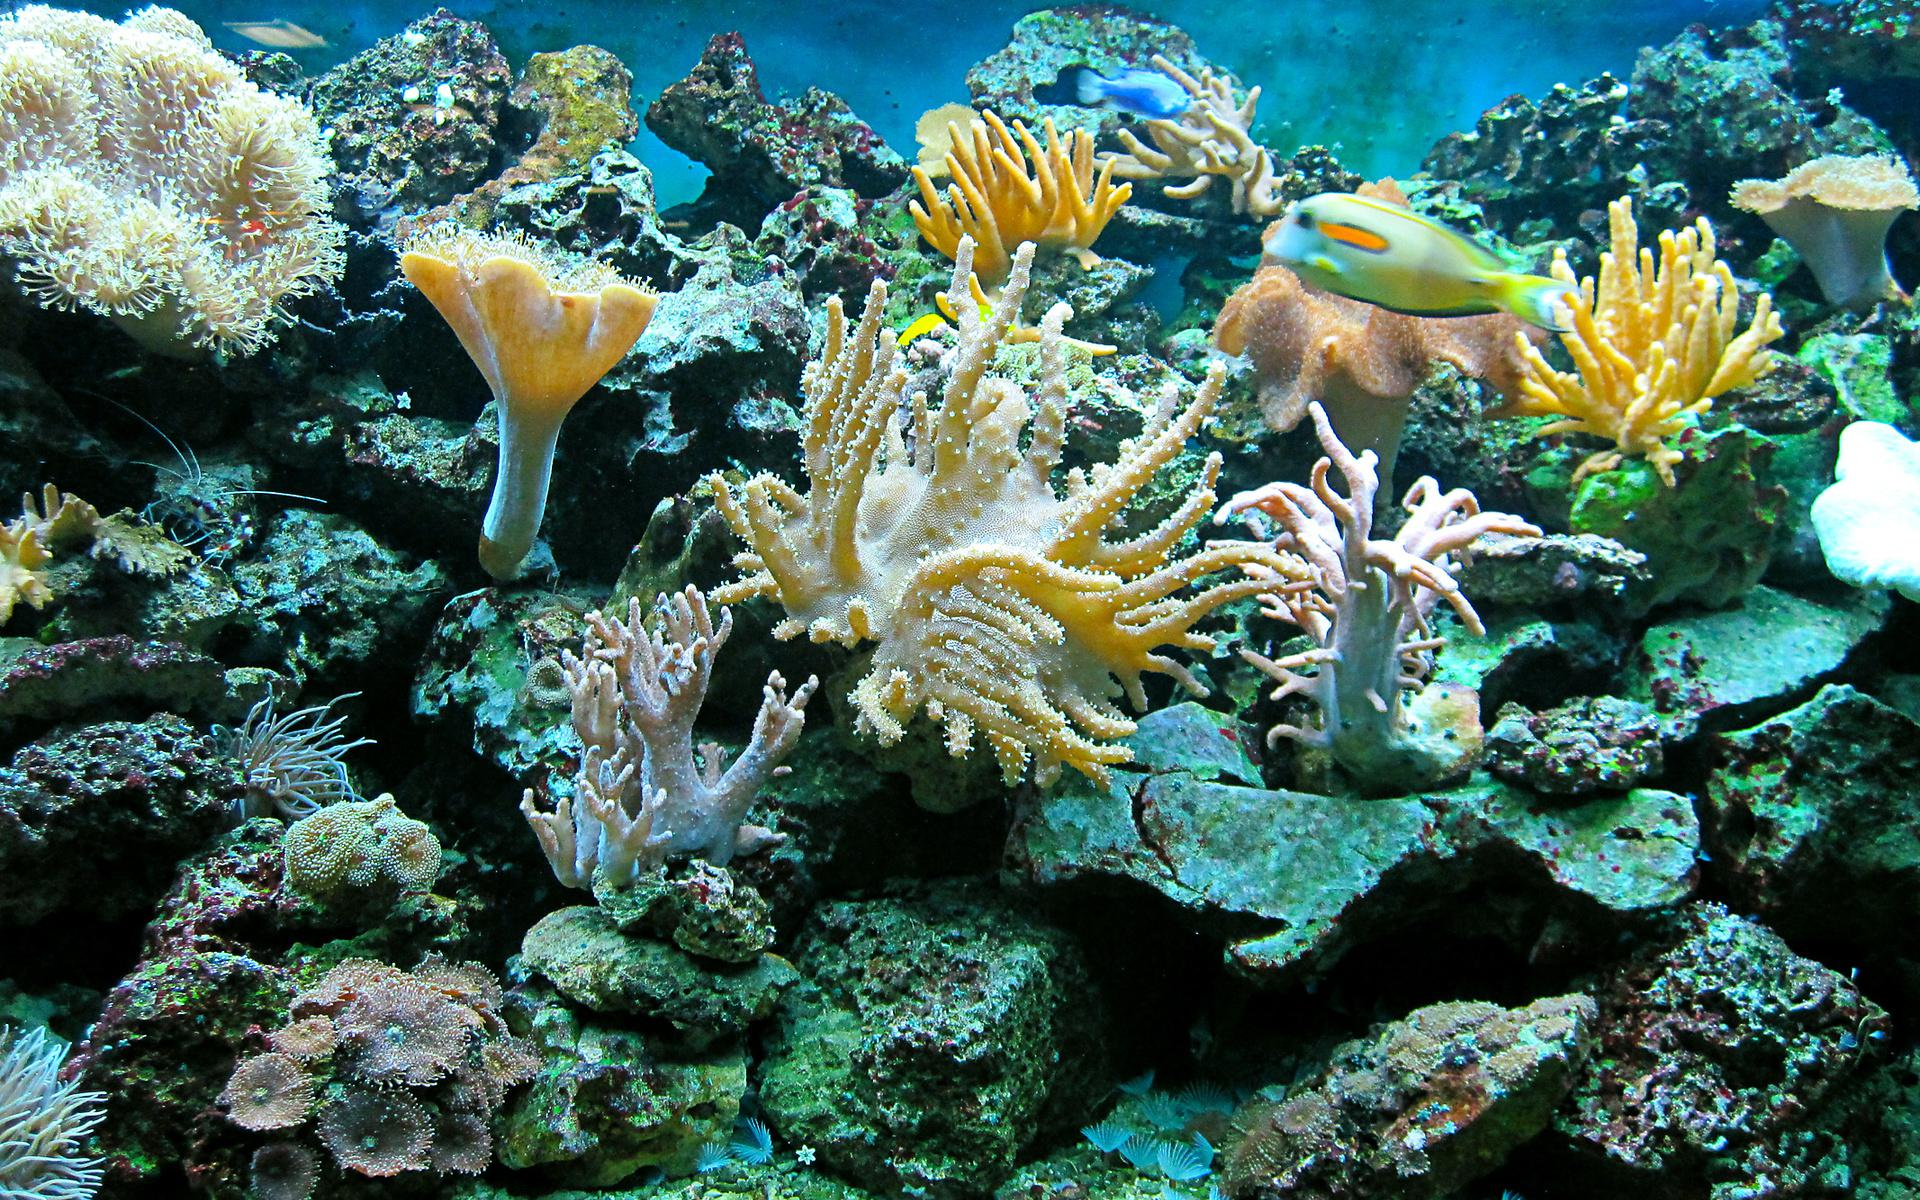 3d Animated Fish Wallpaper Hd Sea Underwater Ocean Reef Fish Widescreen Wallpaper